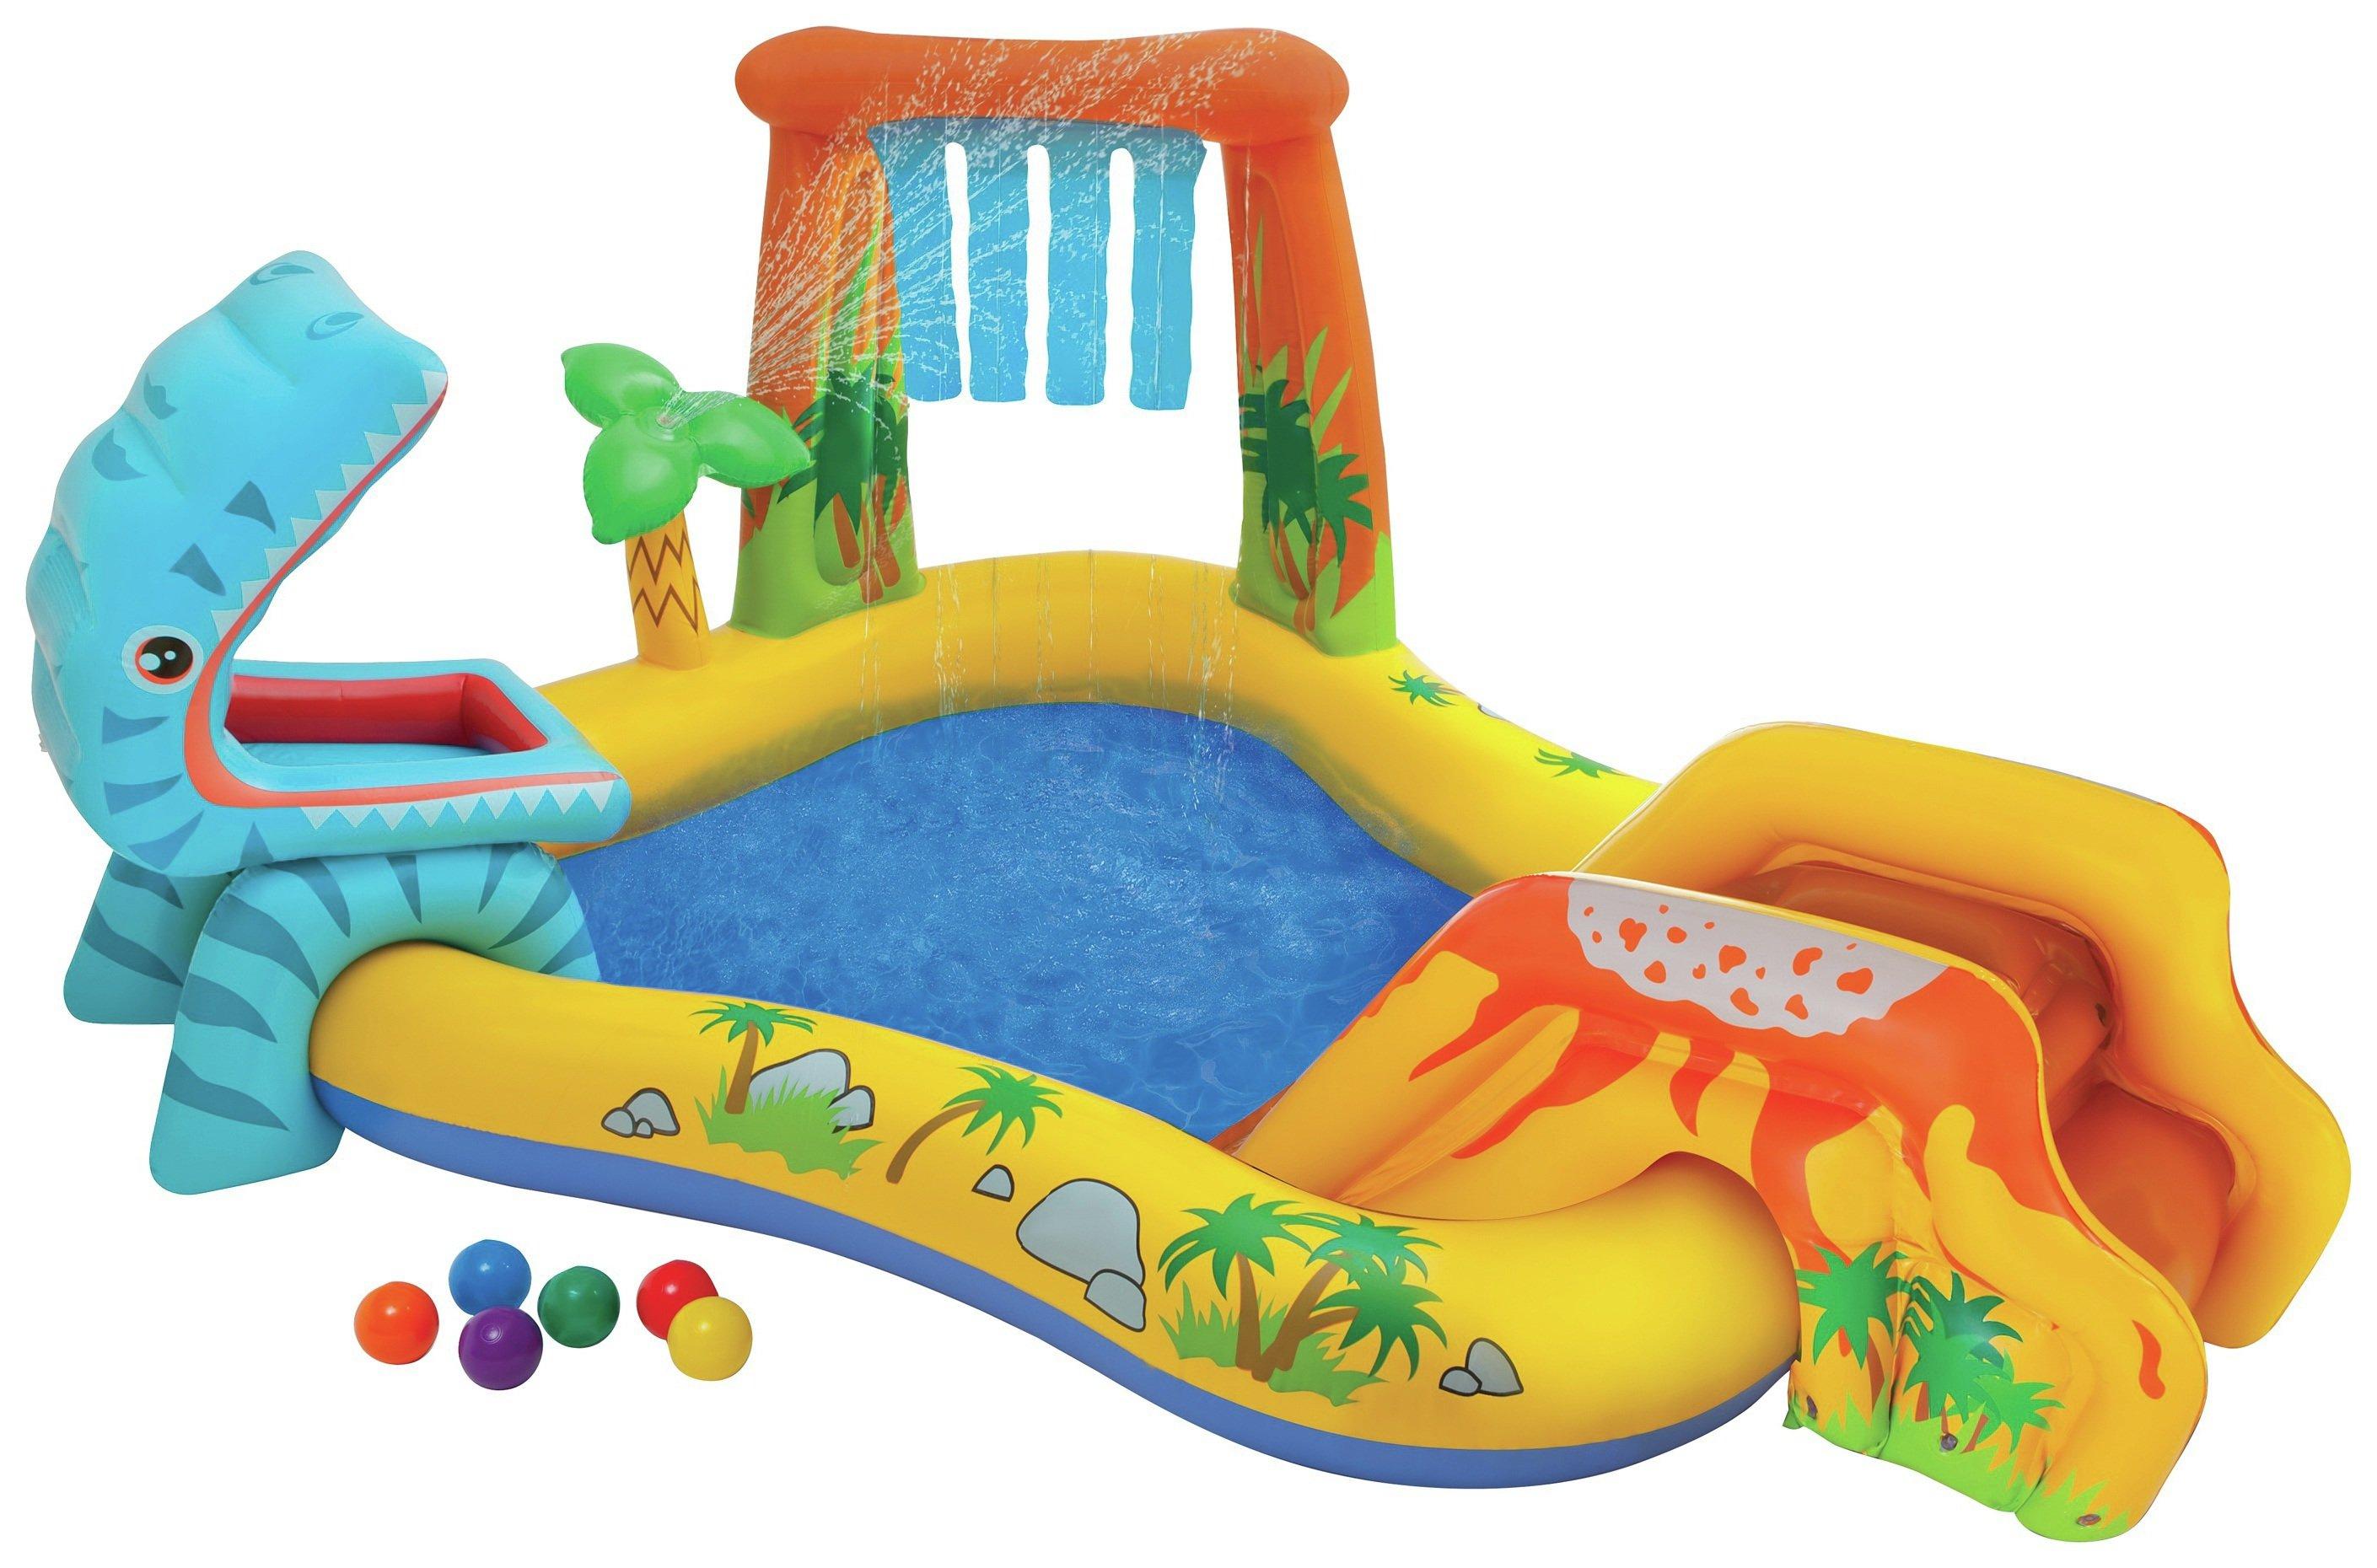 Intex Dinosaur Play Centre Paddling Pool - 8ft - 216 Litres.